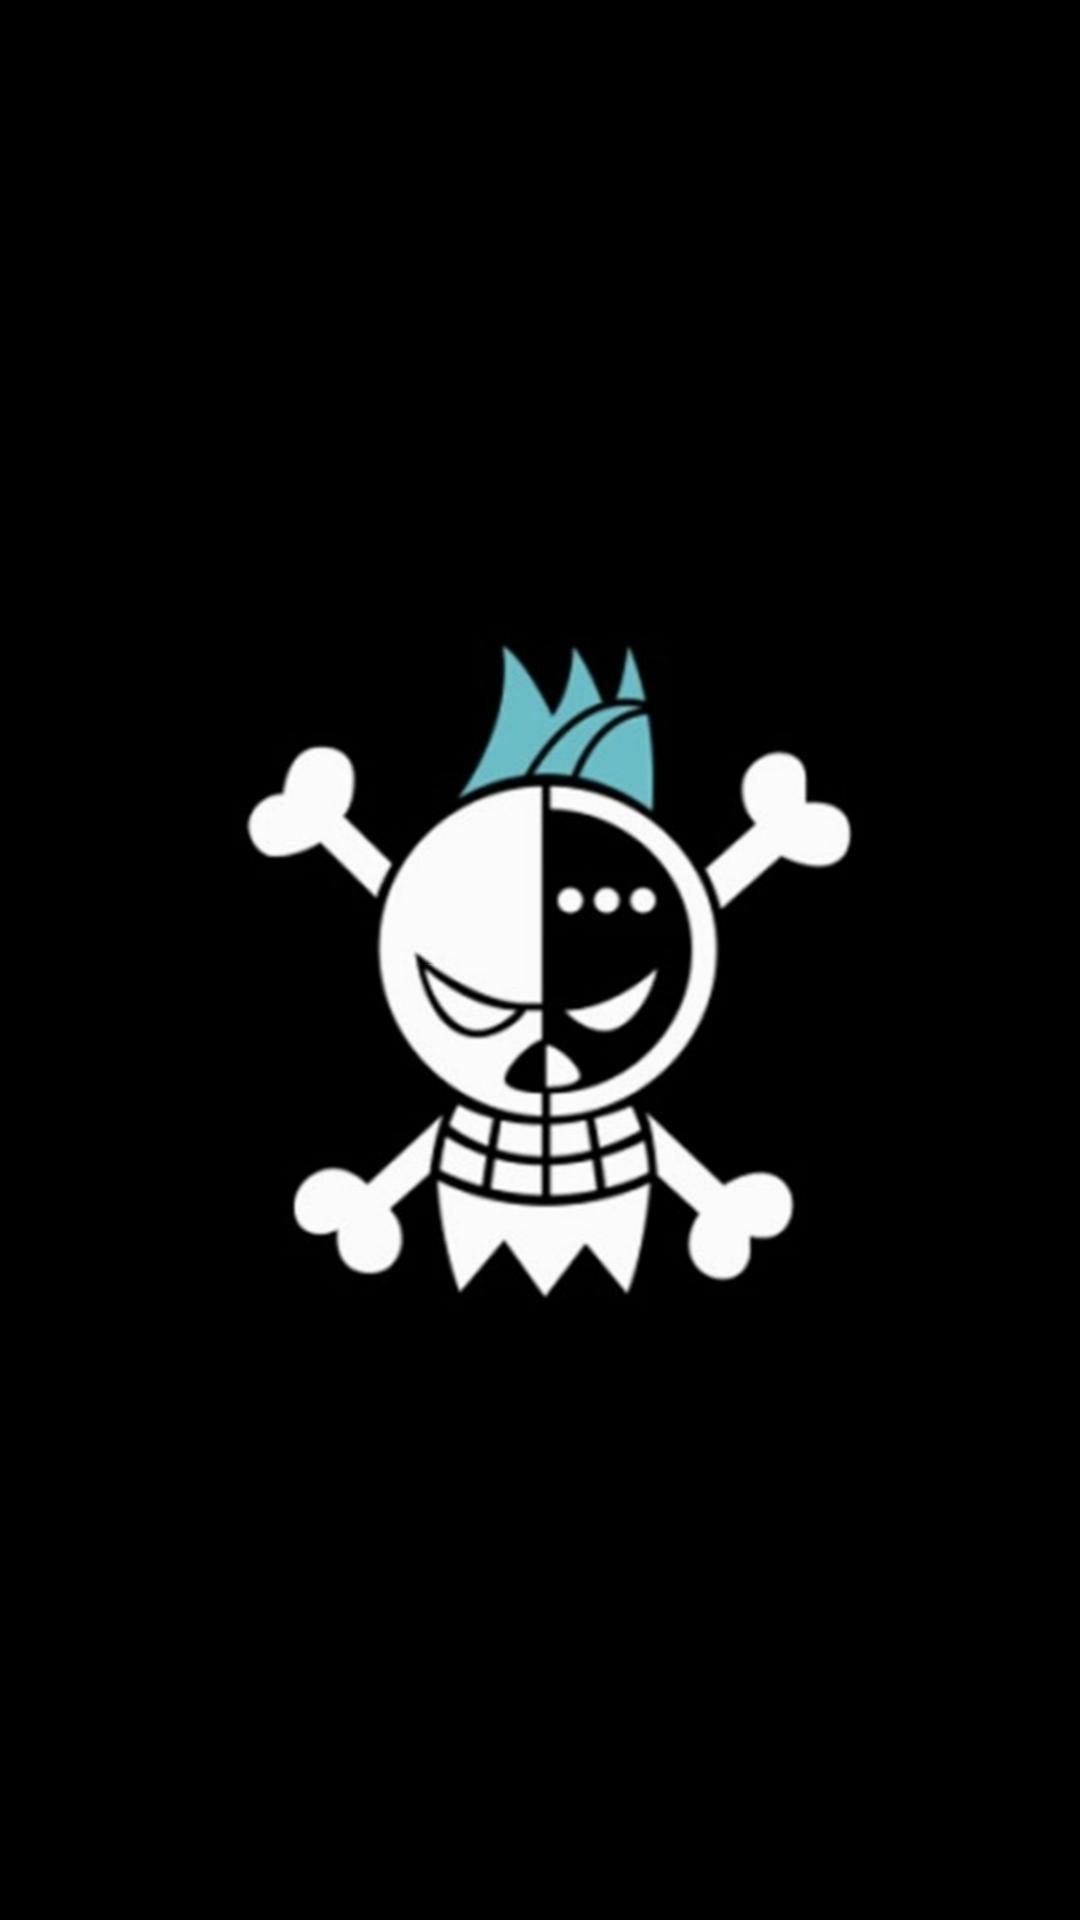 One Piece Iphone 6 Wallpaper Hd Black 1080x1920 Wallpaper Teahub Io